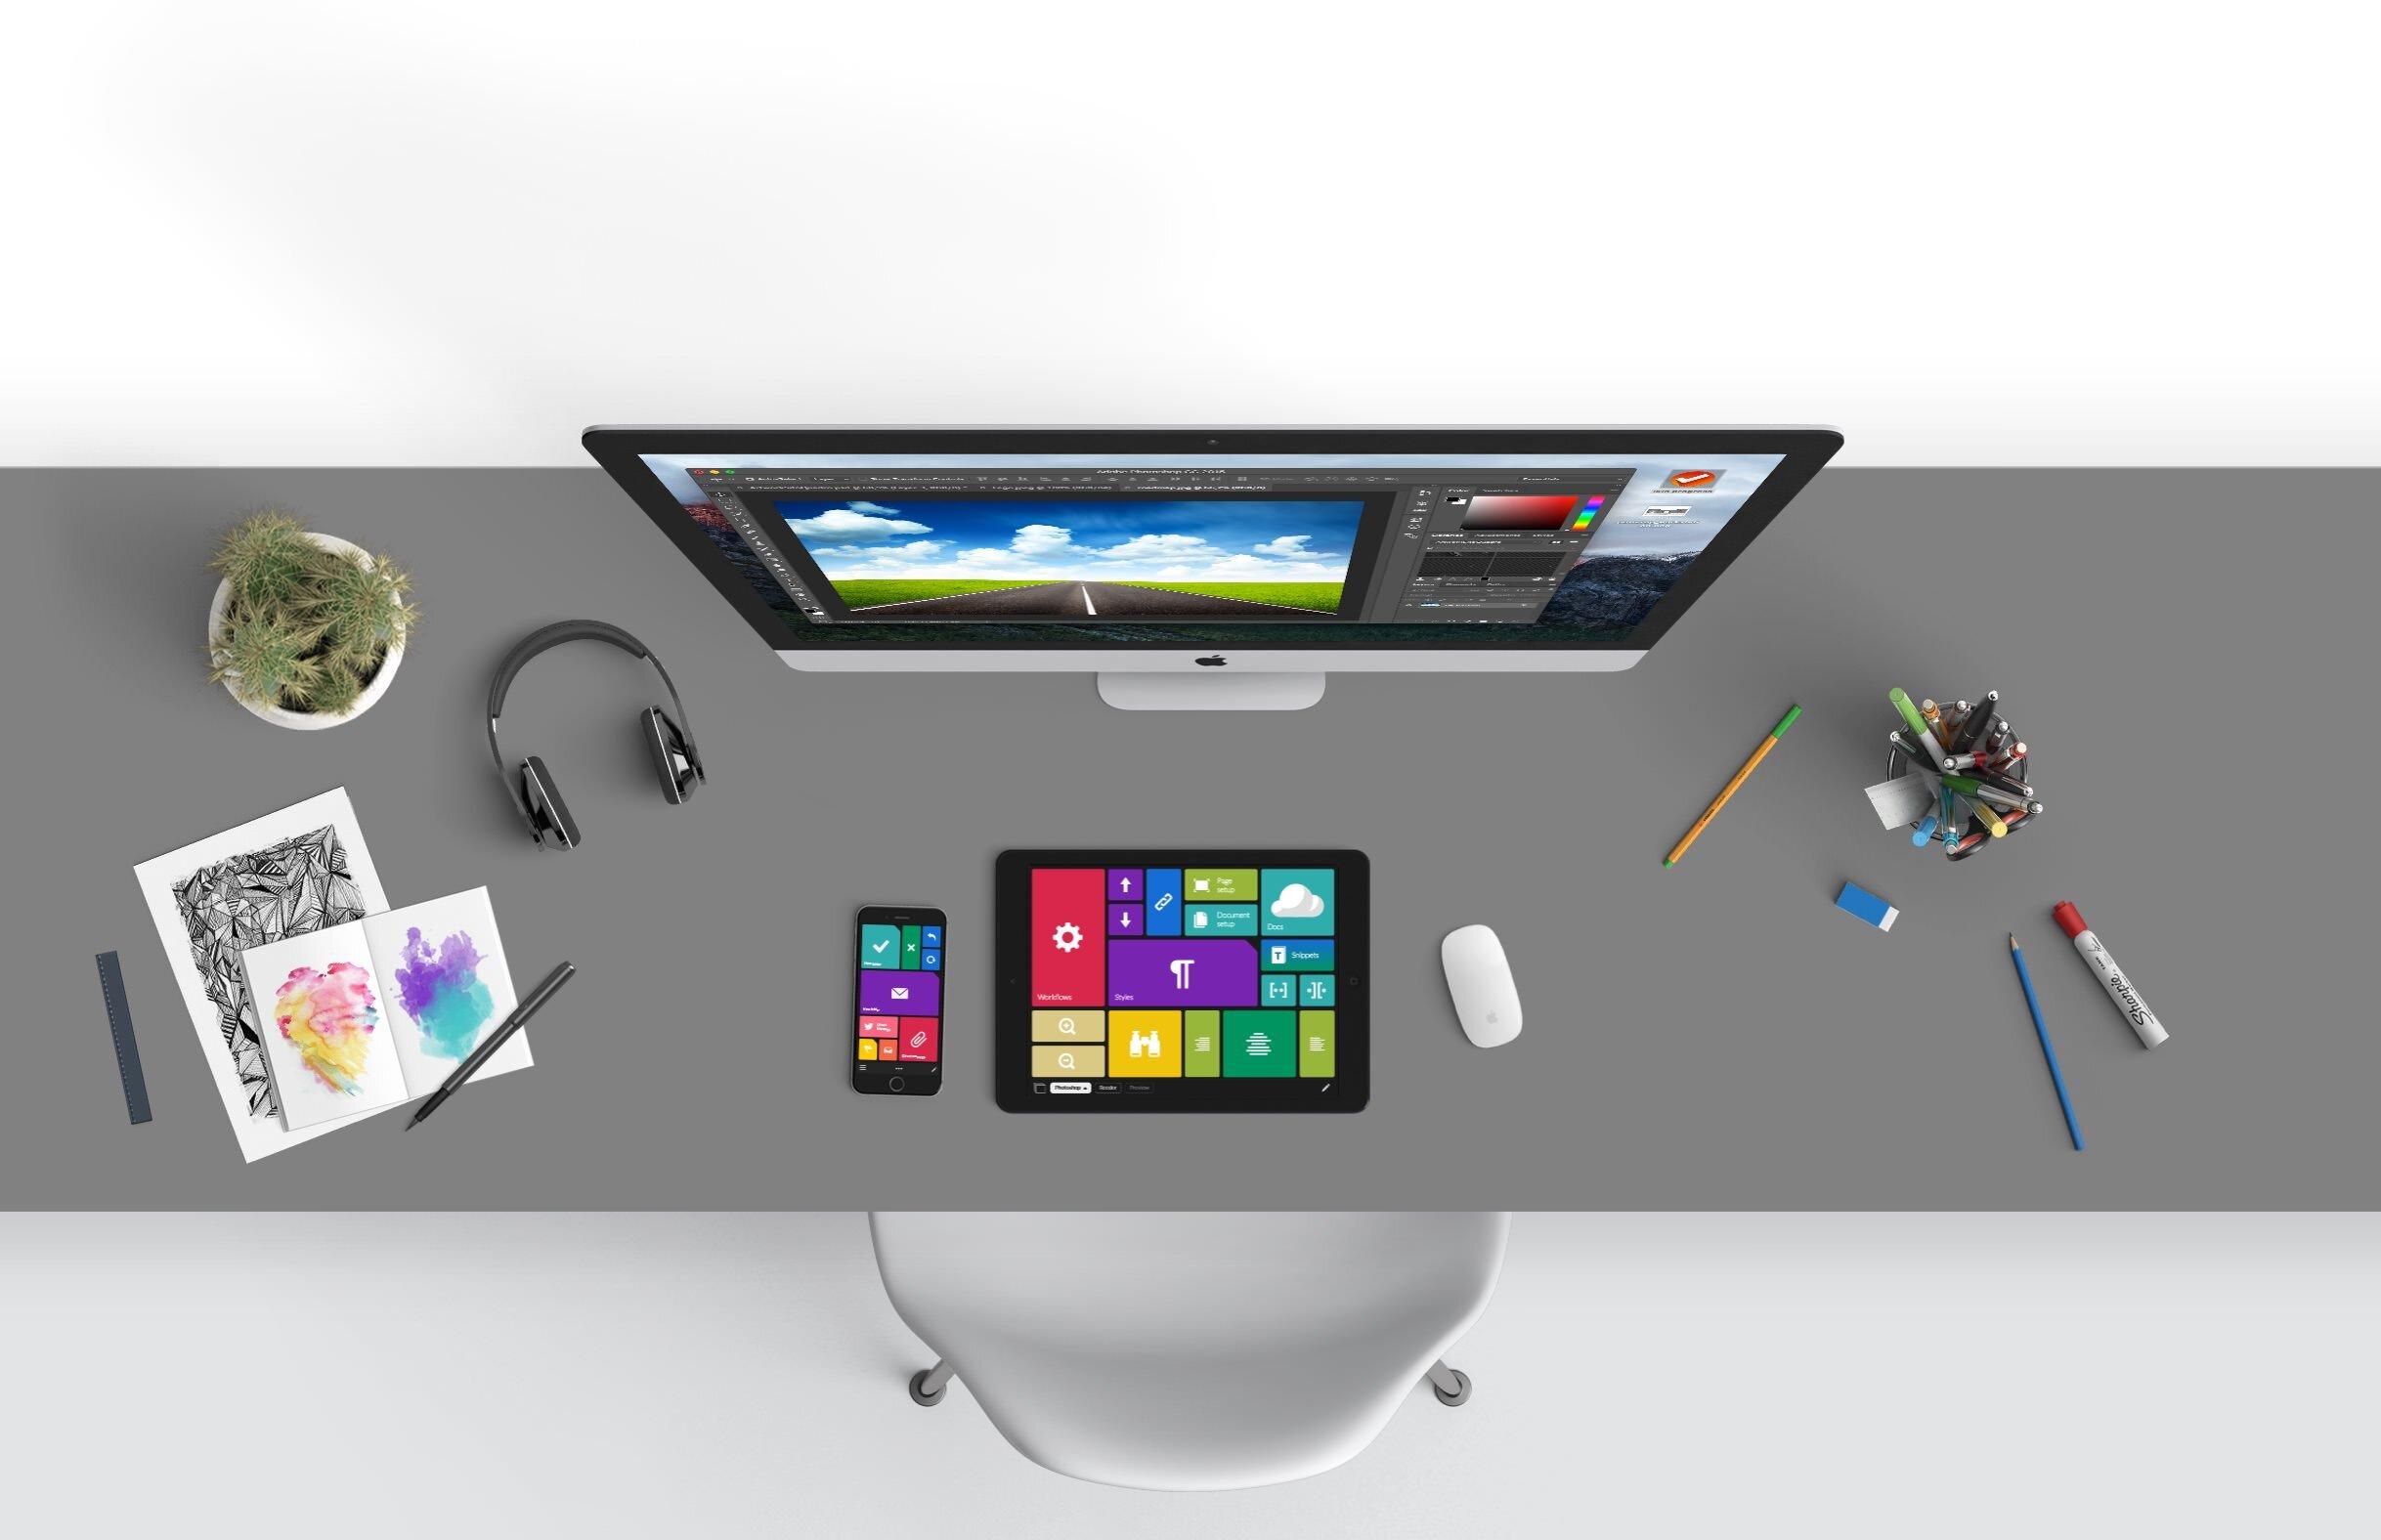 Quadroはパソコンの作業がハイパー円滑になるアプリ